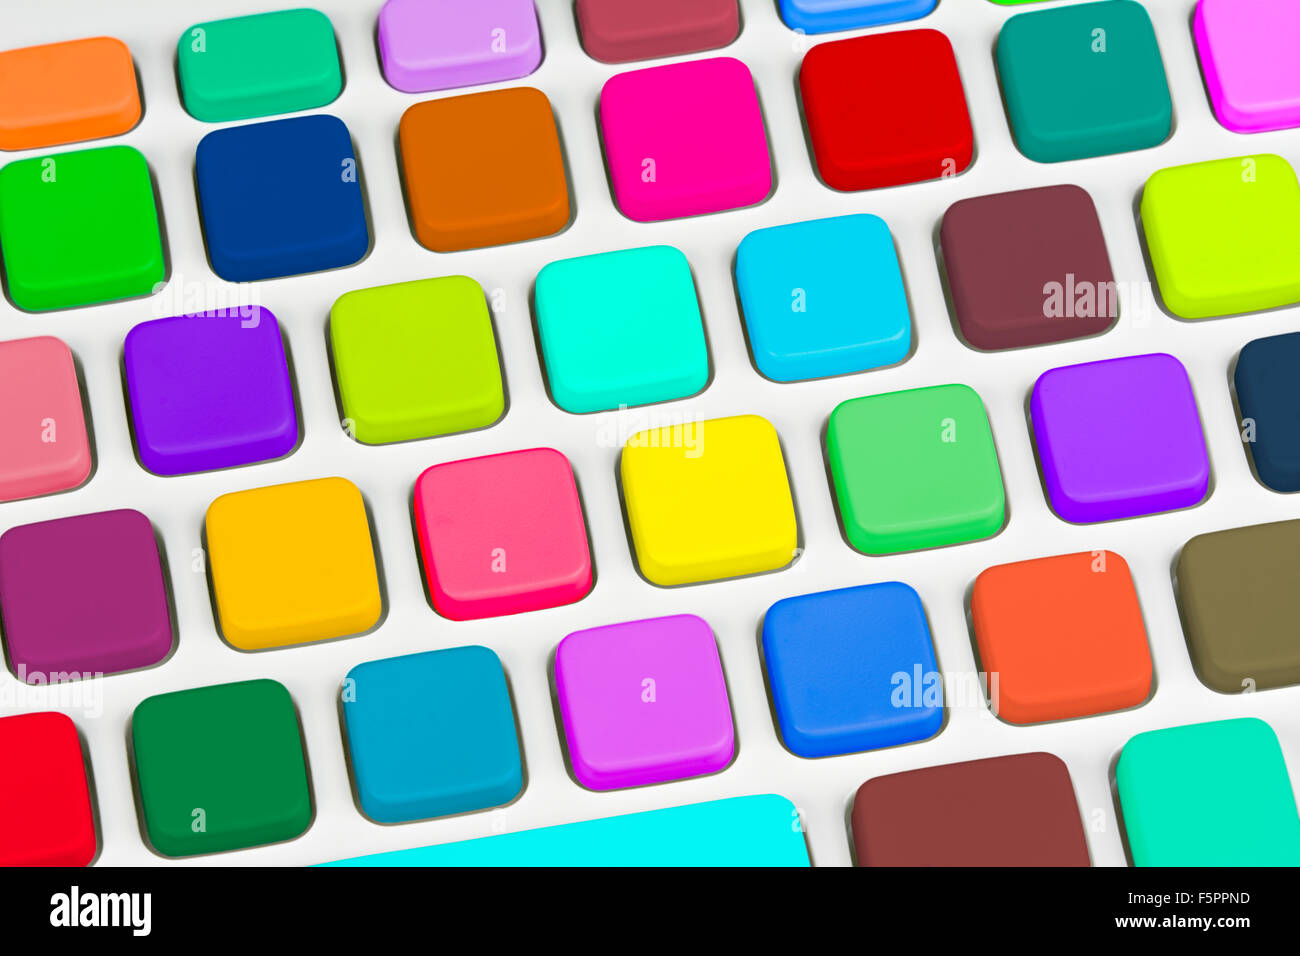 Multicoloured keys on a computer keyboard. - Stock Image